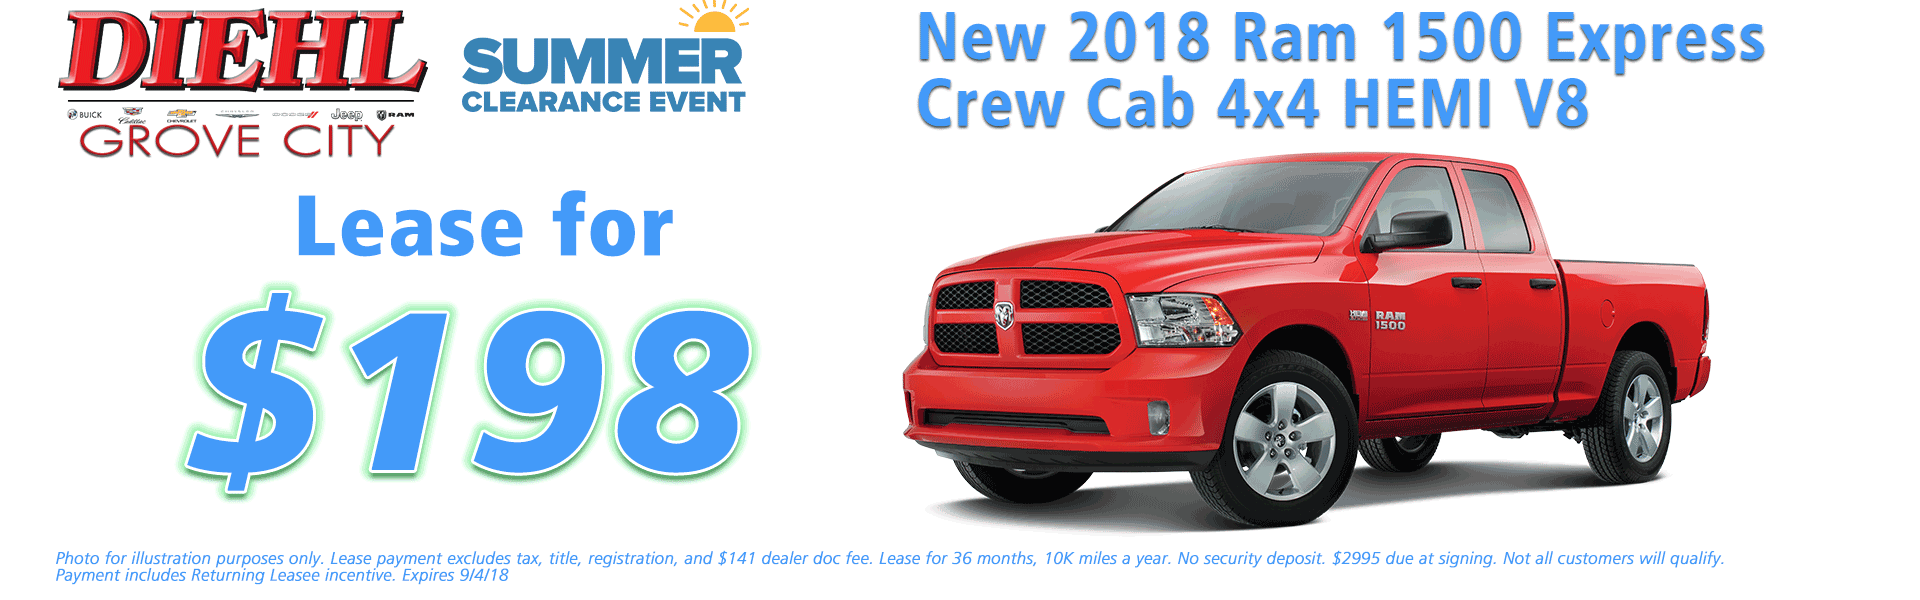 Diehl of Grove City, Grove City, PA 16127 Chrysler Jeep Dodge Ram Chevrolet Buick Cadillac NEW 2018 RAM 1500 EXPRESS CREW CAB 4X4 5'7